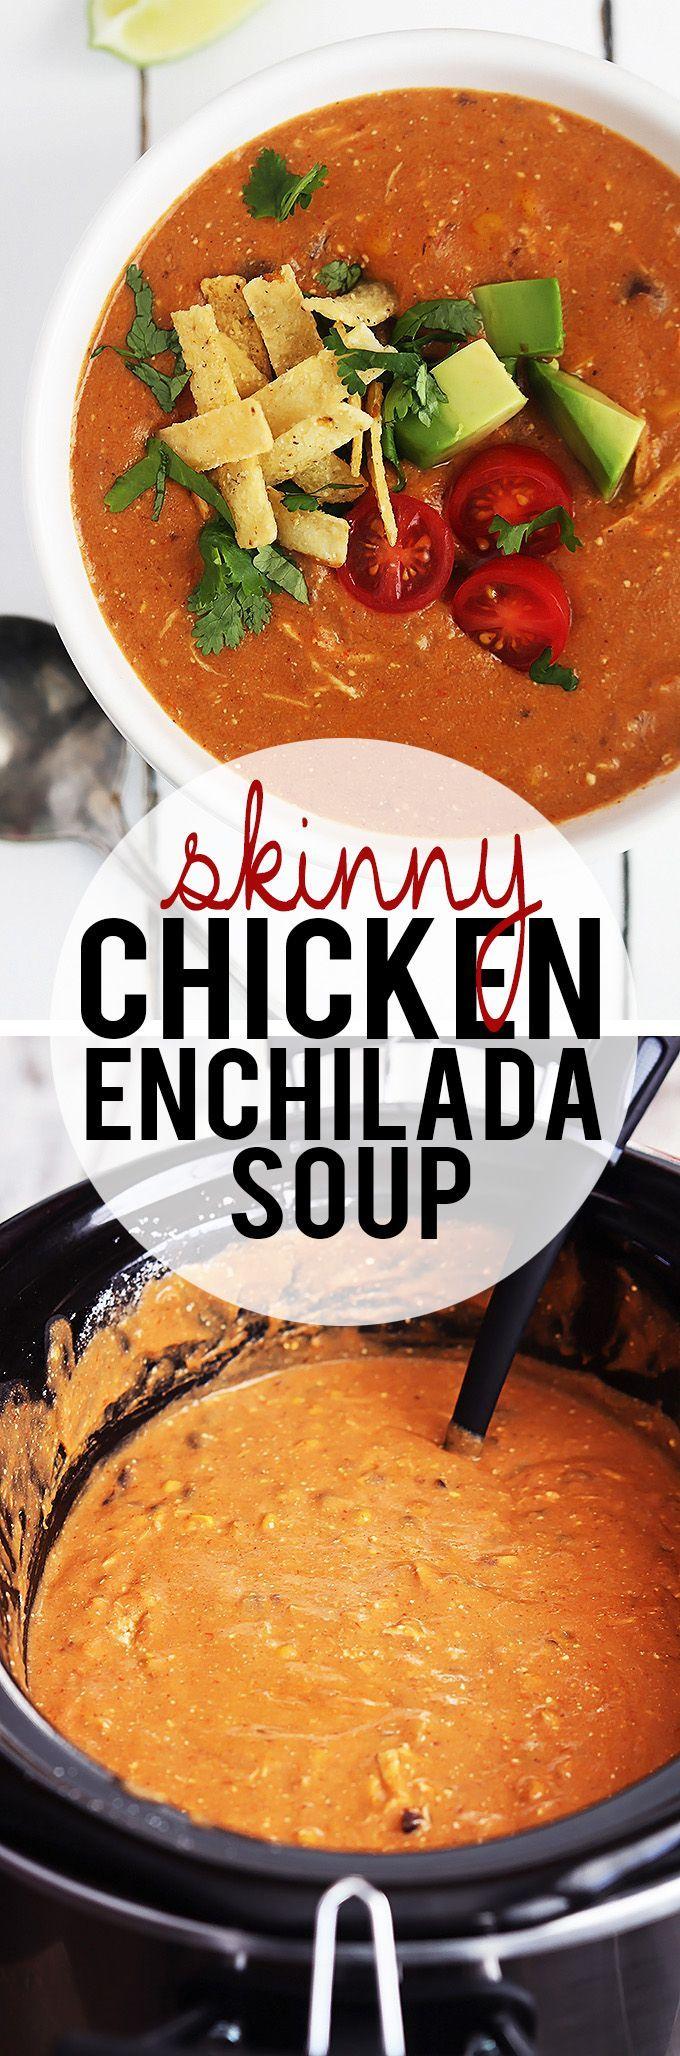 Skinny Chicken Enchilada Soup - creamy, cheesy, yet guilt-free!